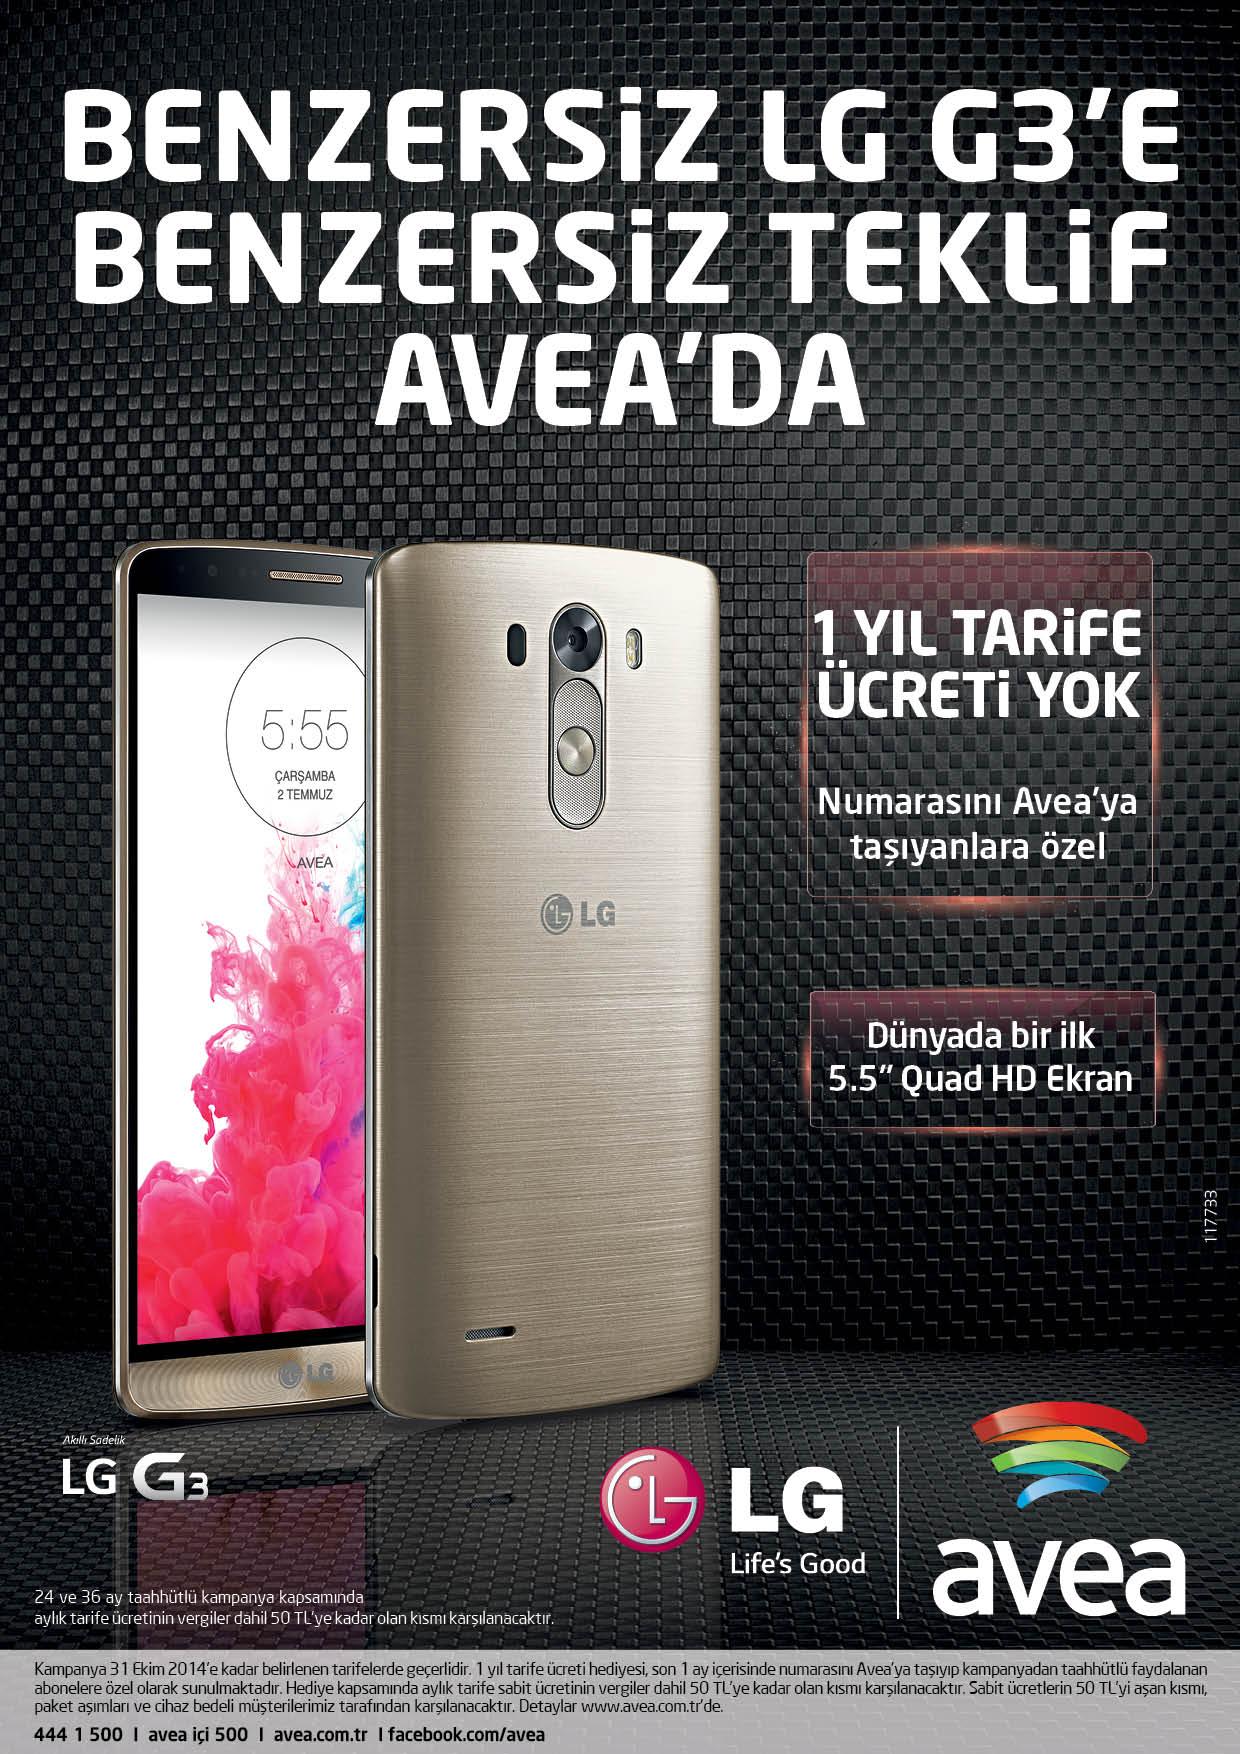 LG-G3-Avea-webeyn